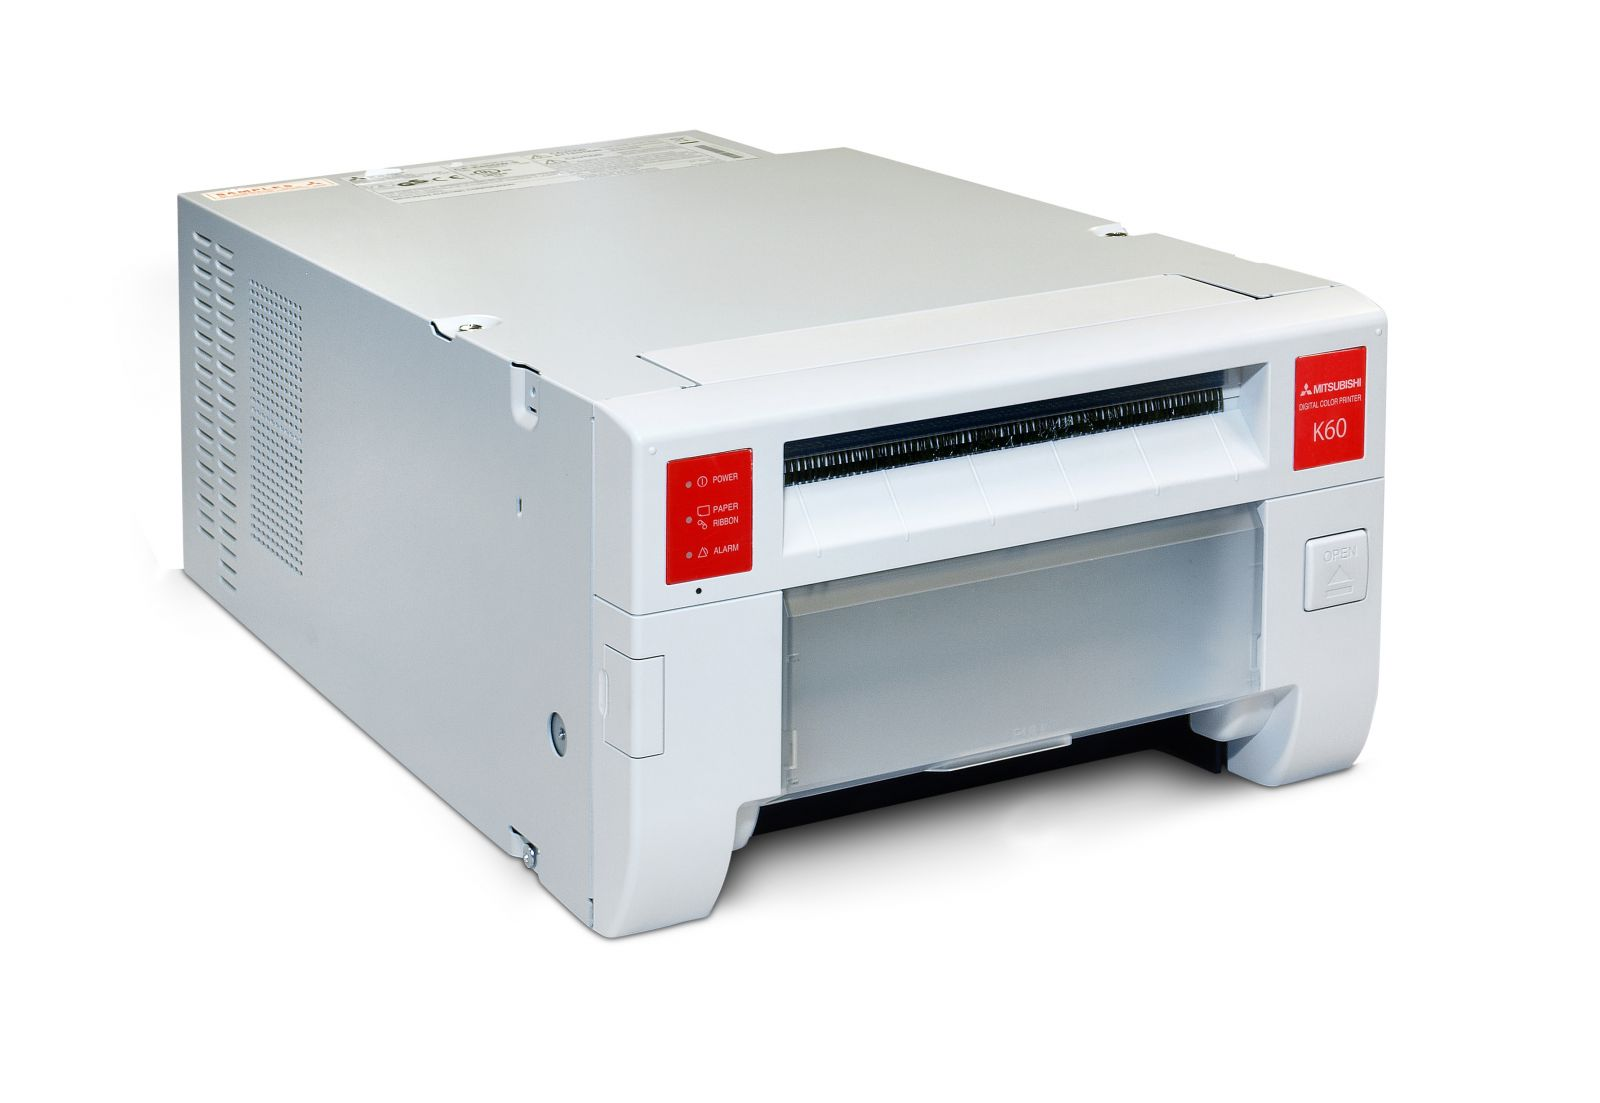 mitsubishi cp-k60dw-s photo printer - system insight - instant